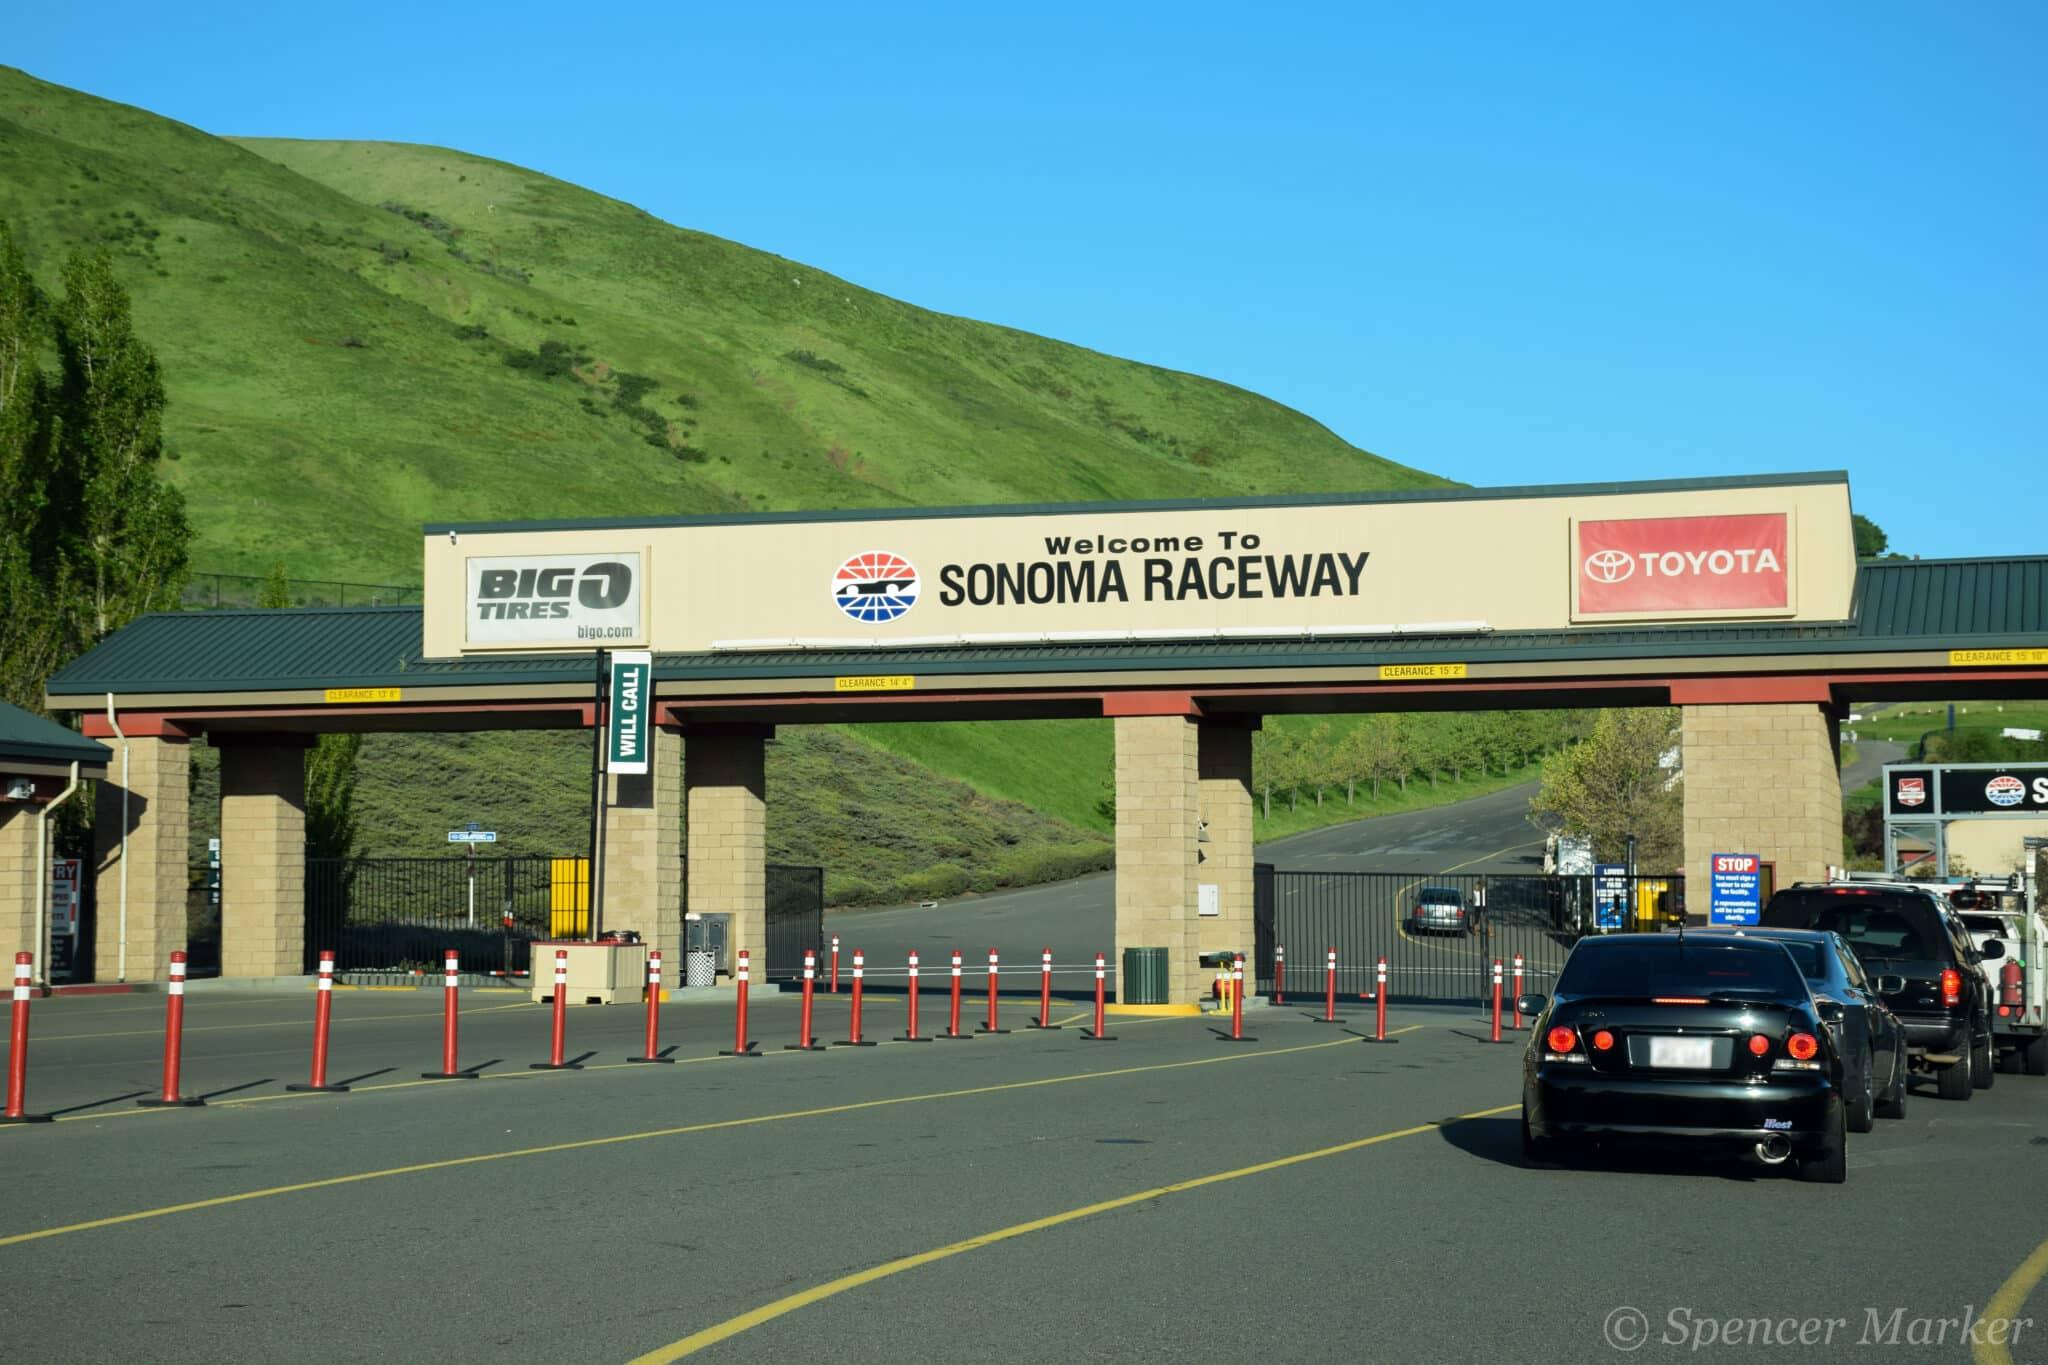 The entrance to Sonoma Raceway